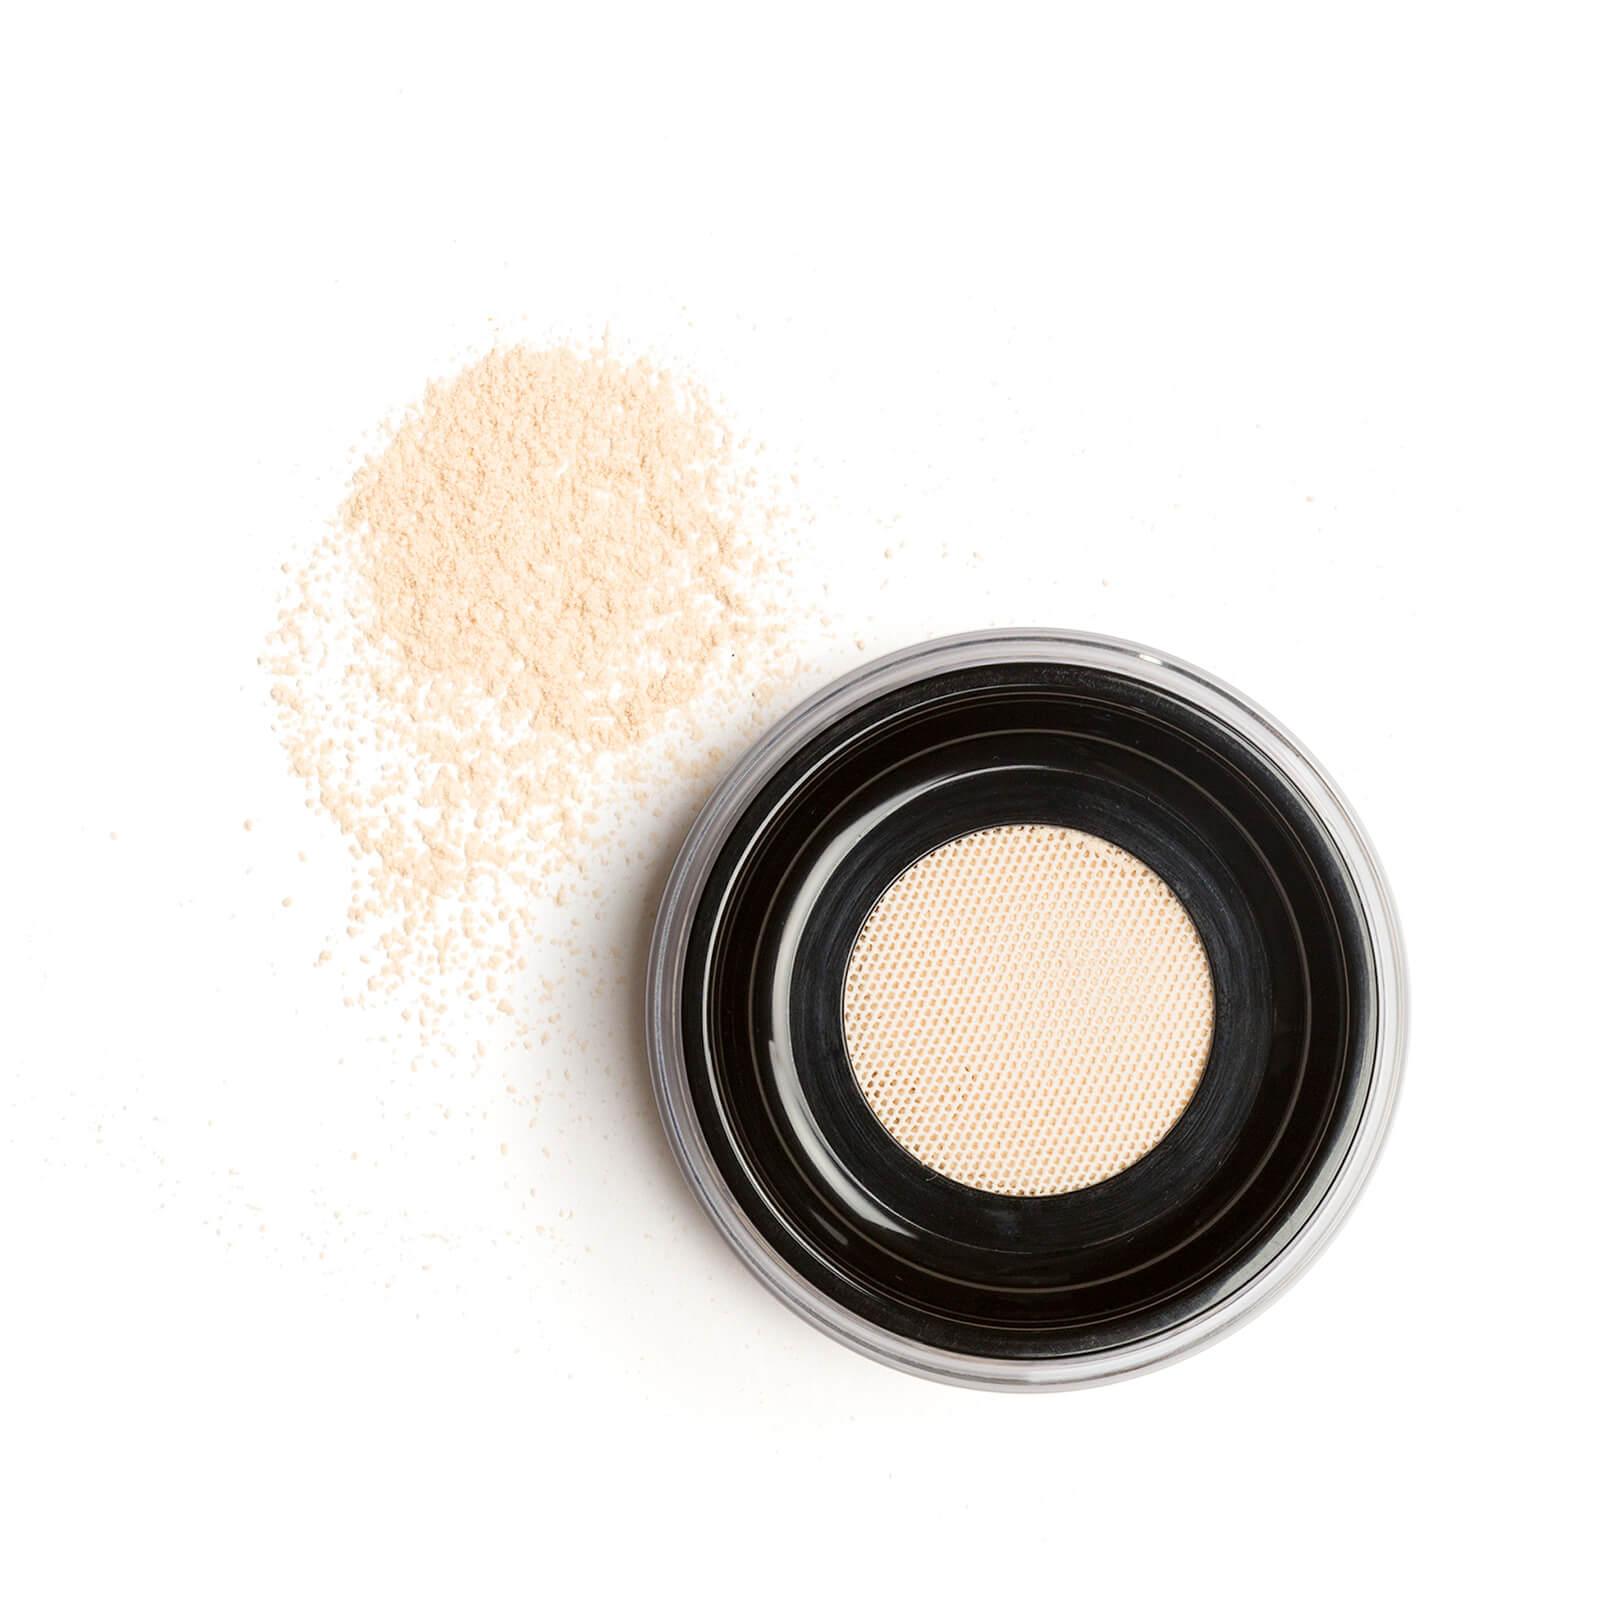 mirenesse Face Glow Setting Powder 8g